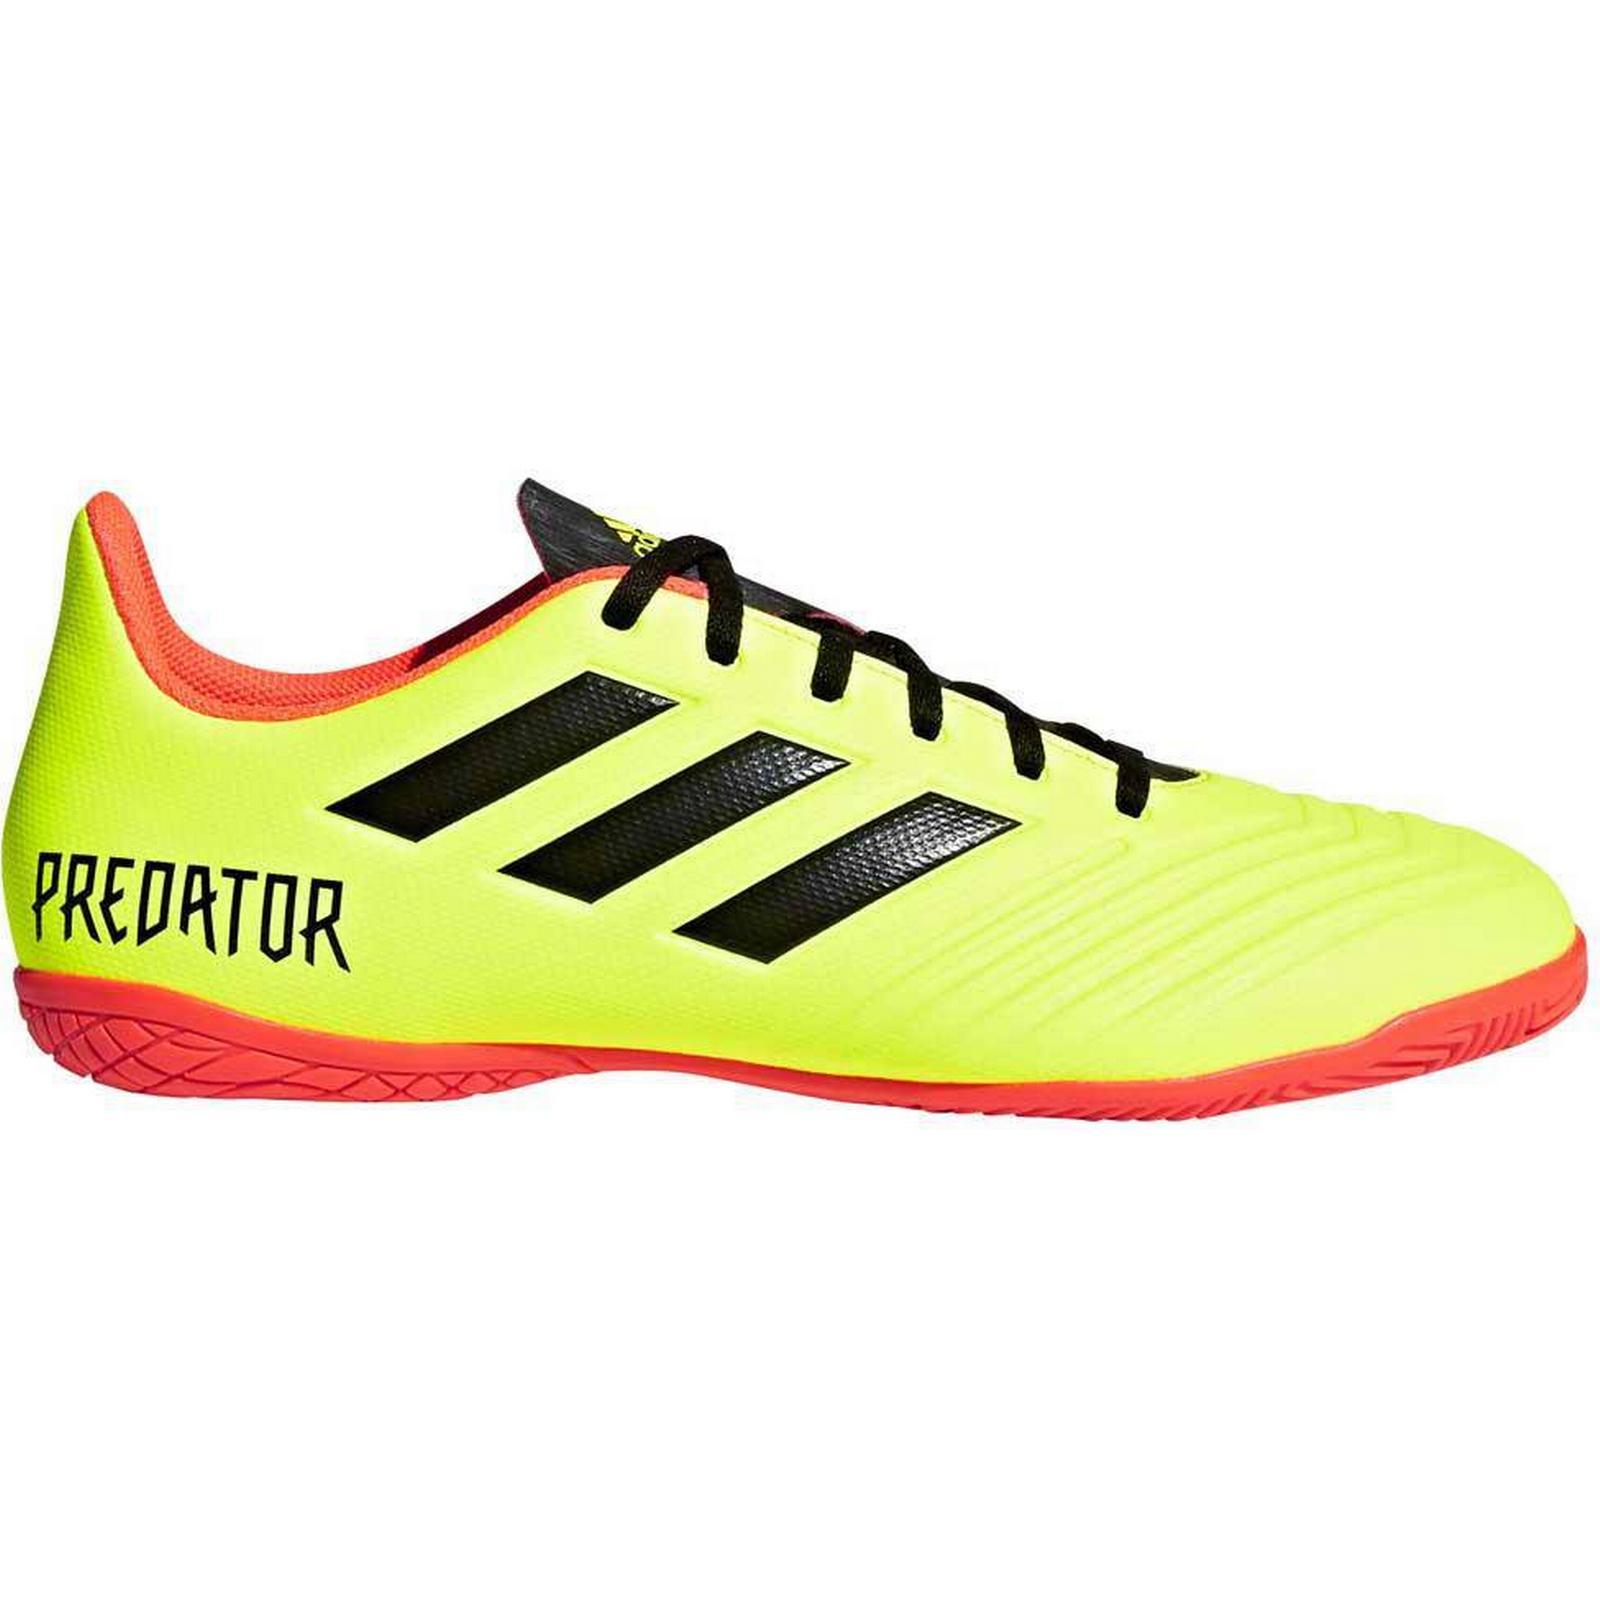 Adidas Predator Predator Predator Tango 18.4 In eeb68a